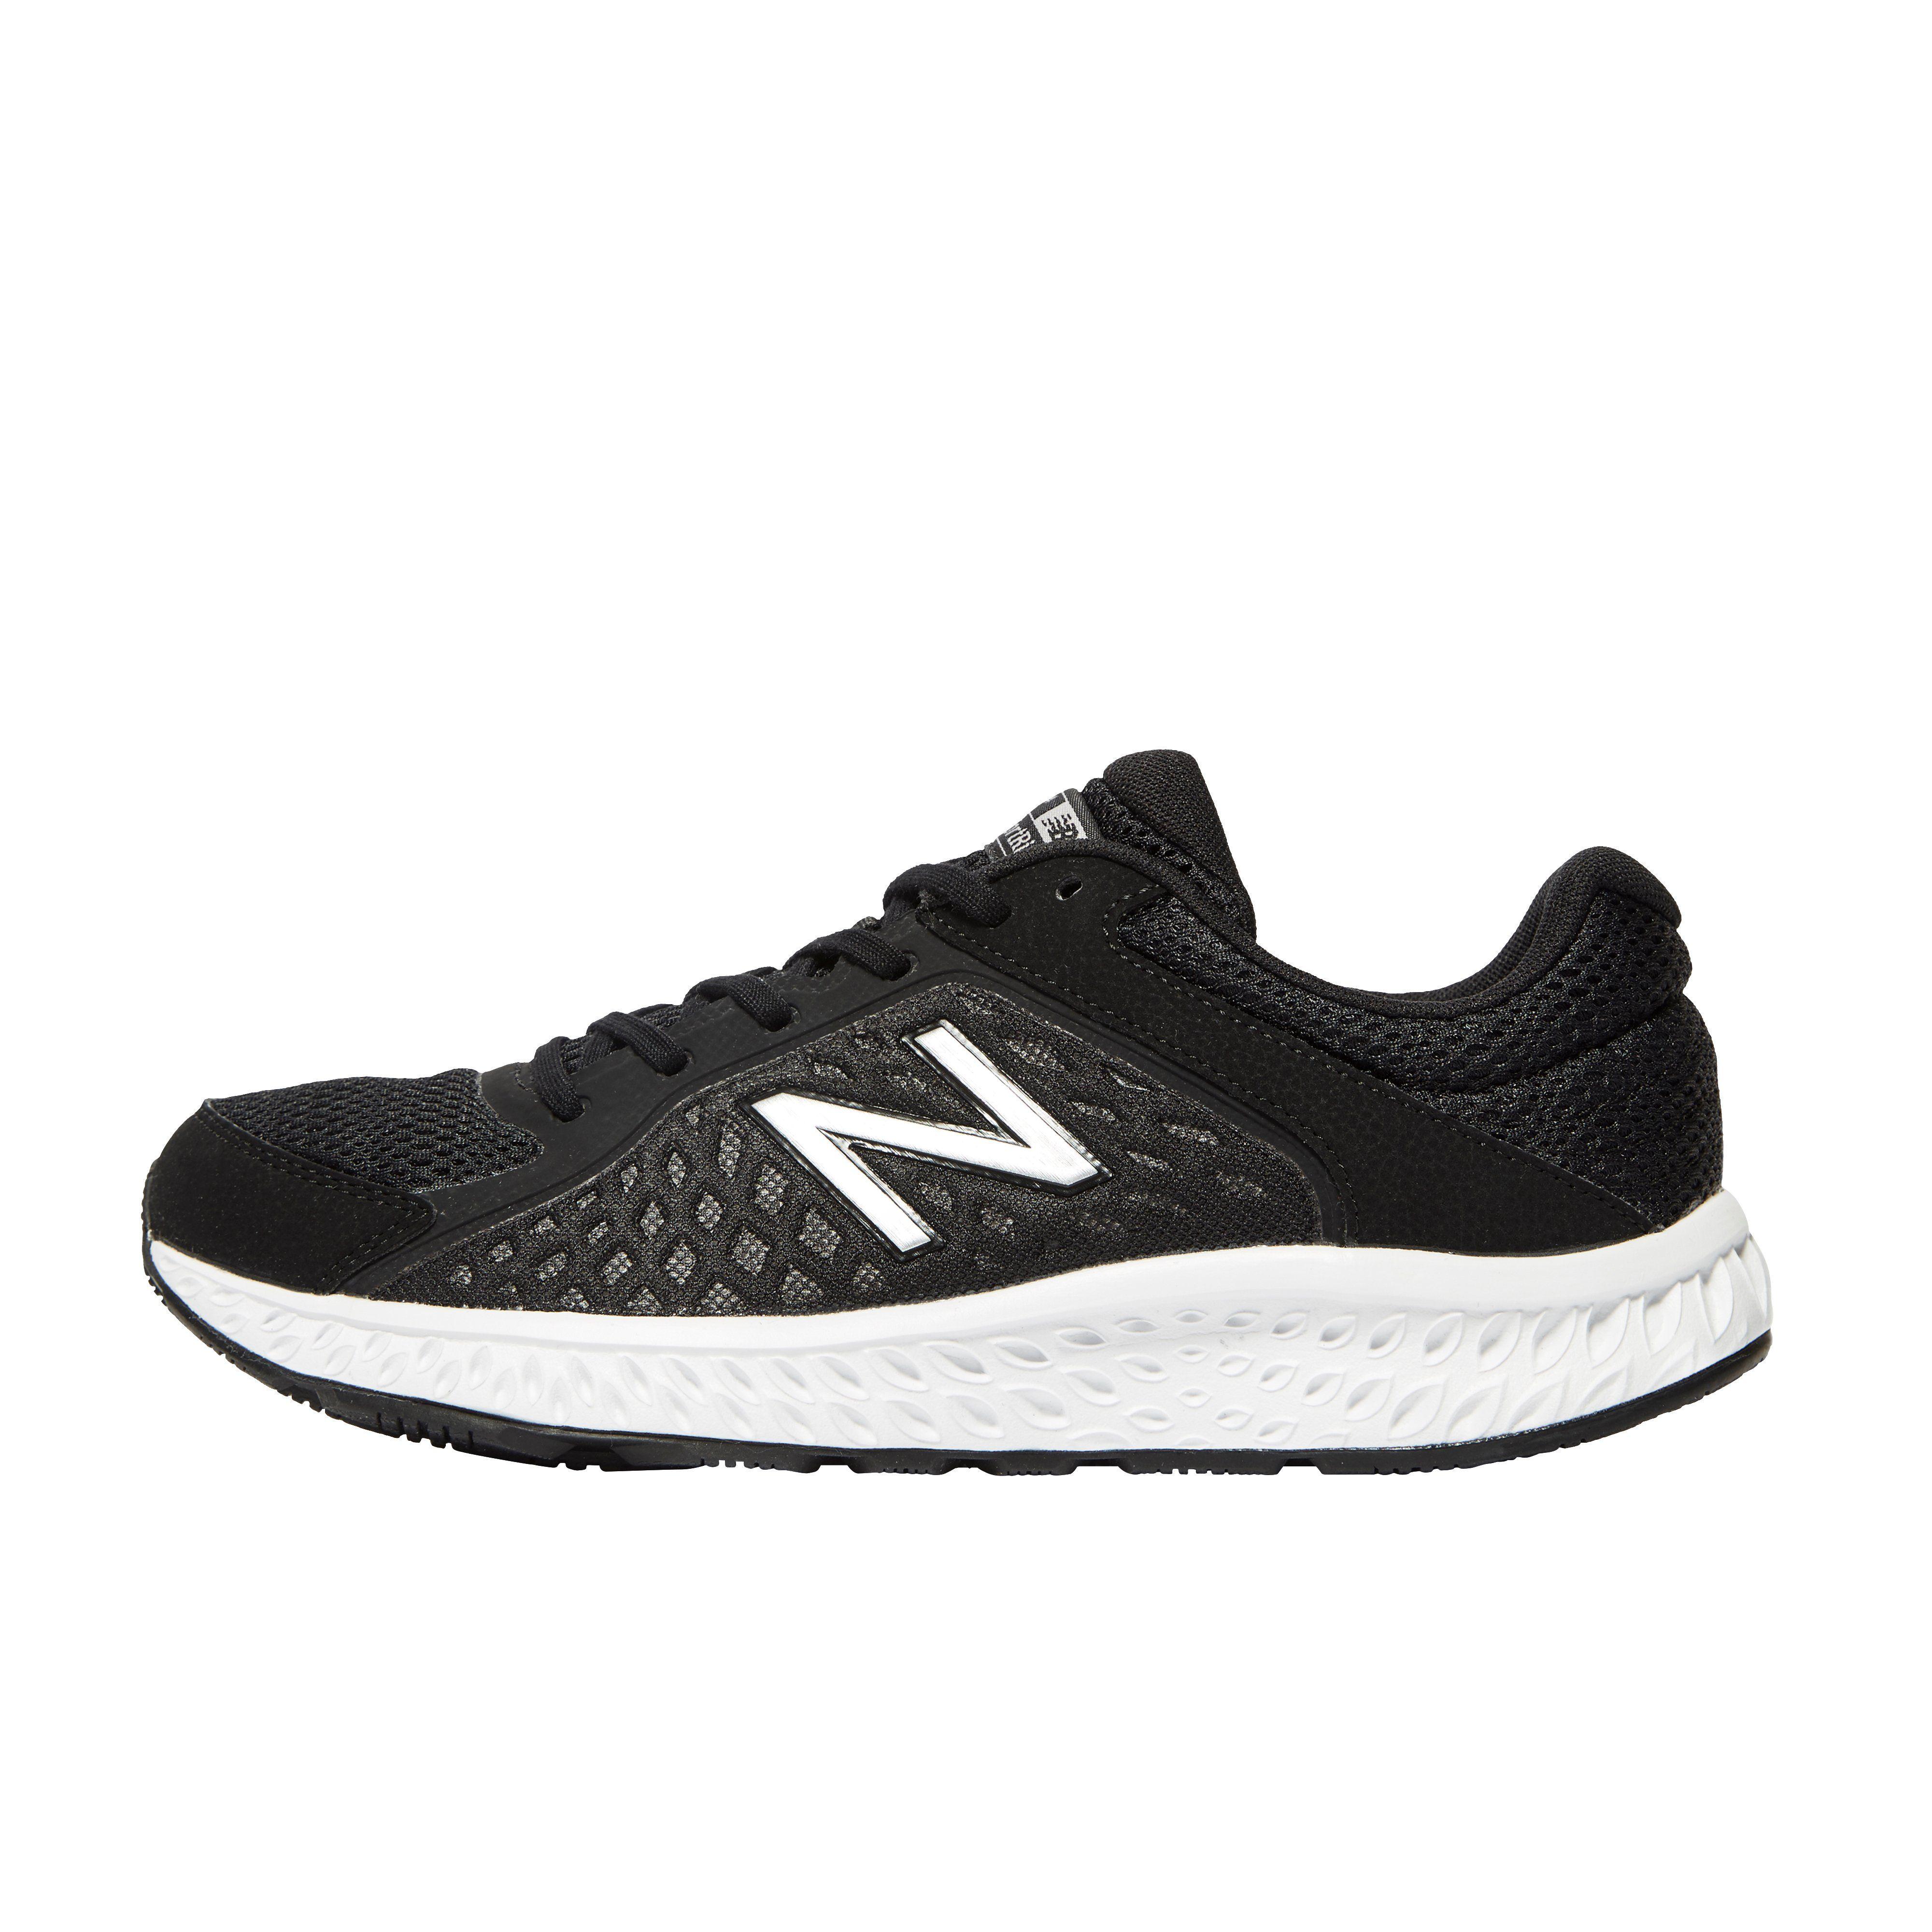 Mens M420v4 Running Shoes New Balance